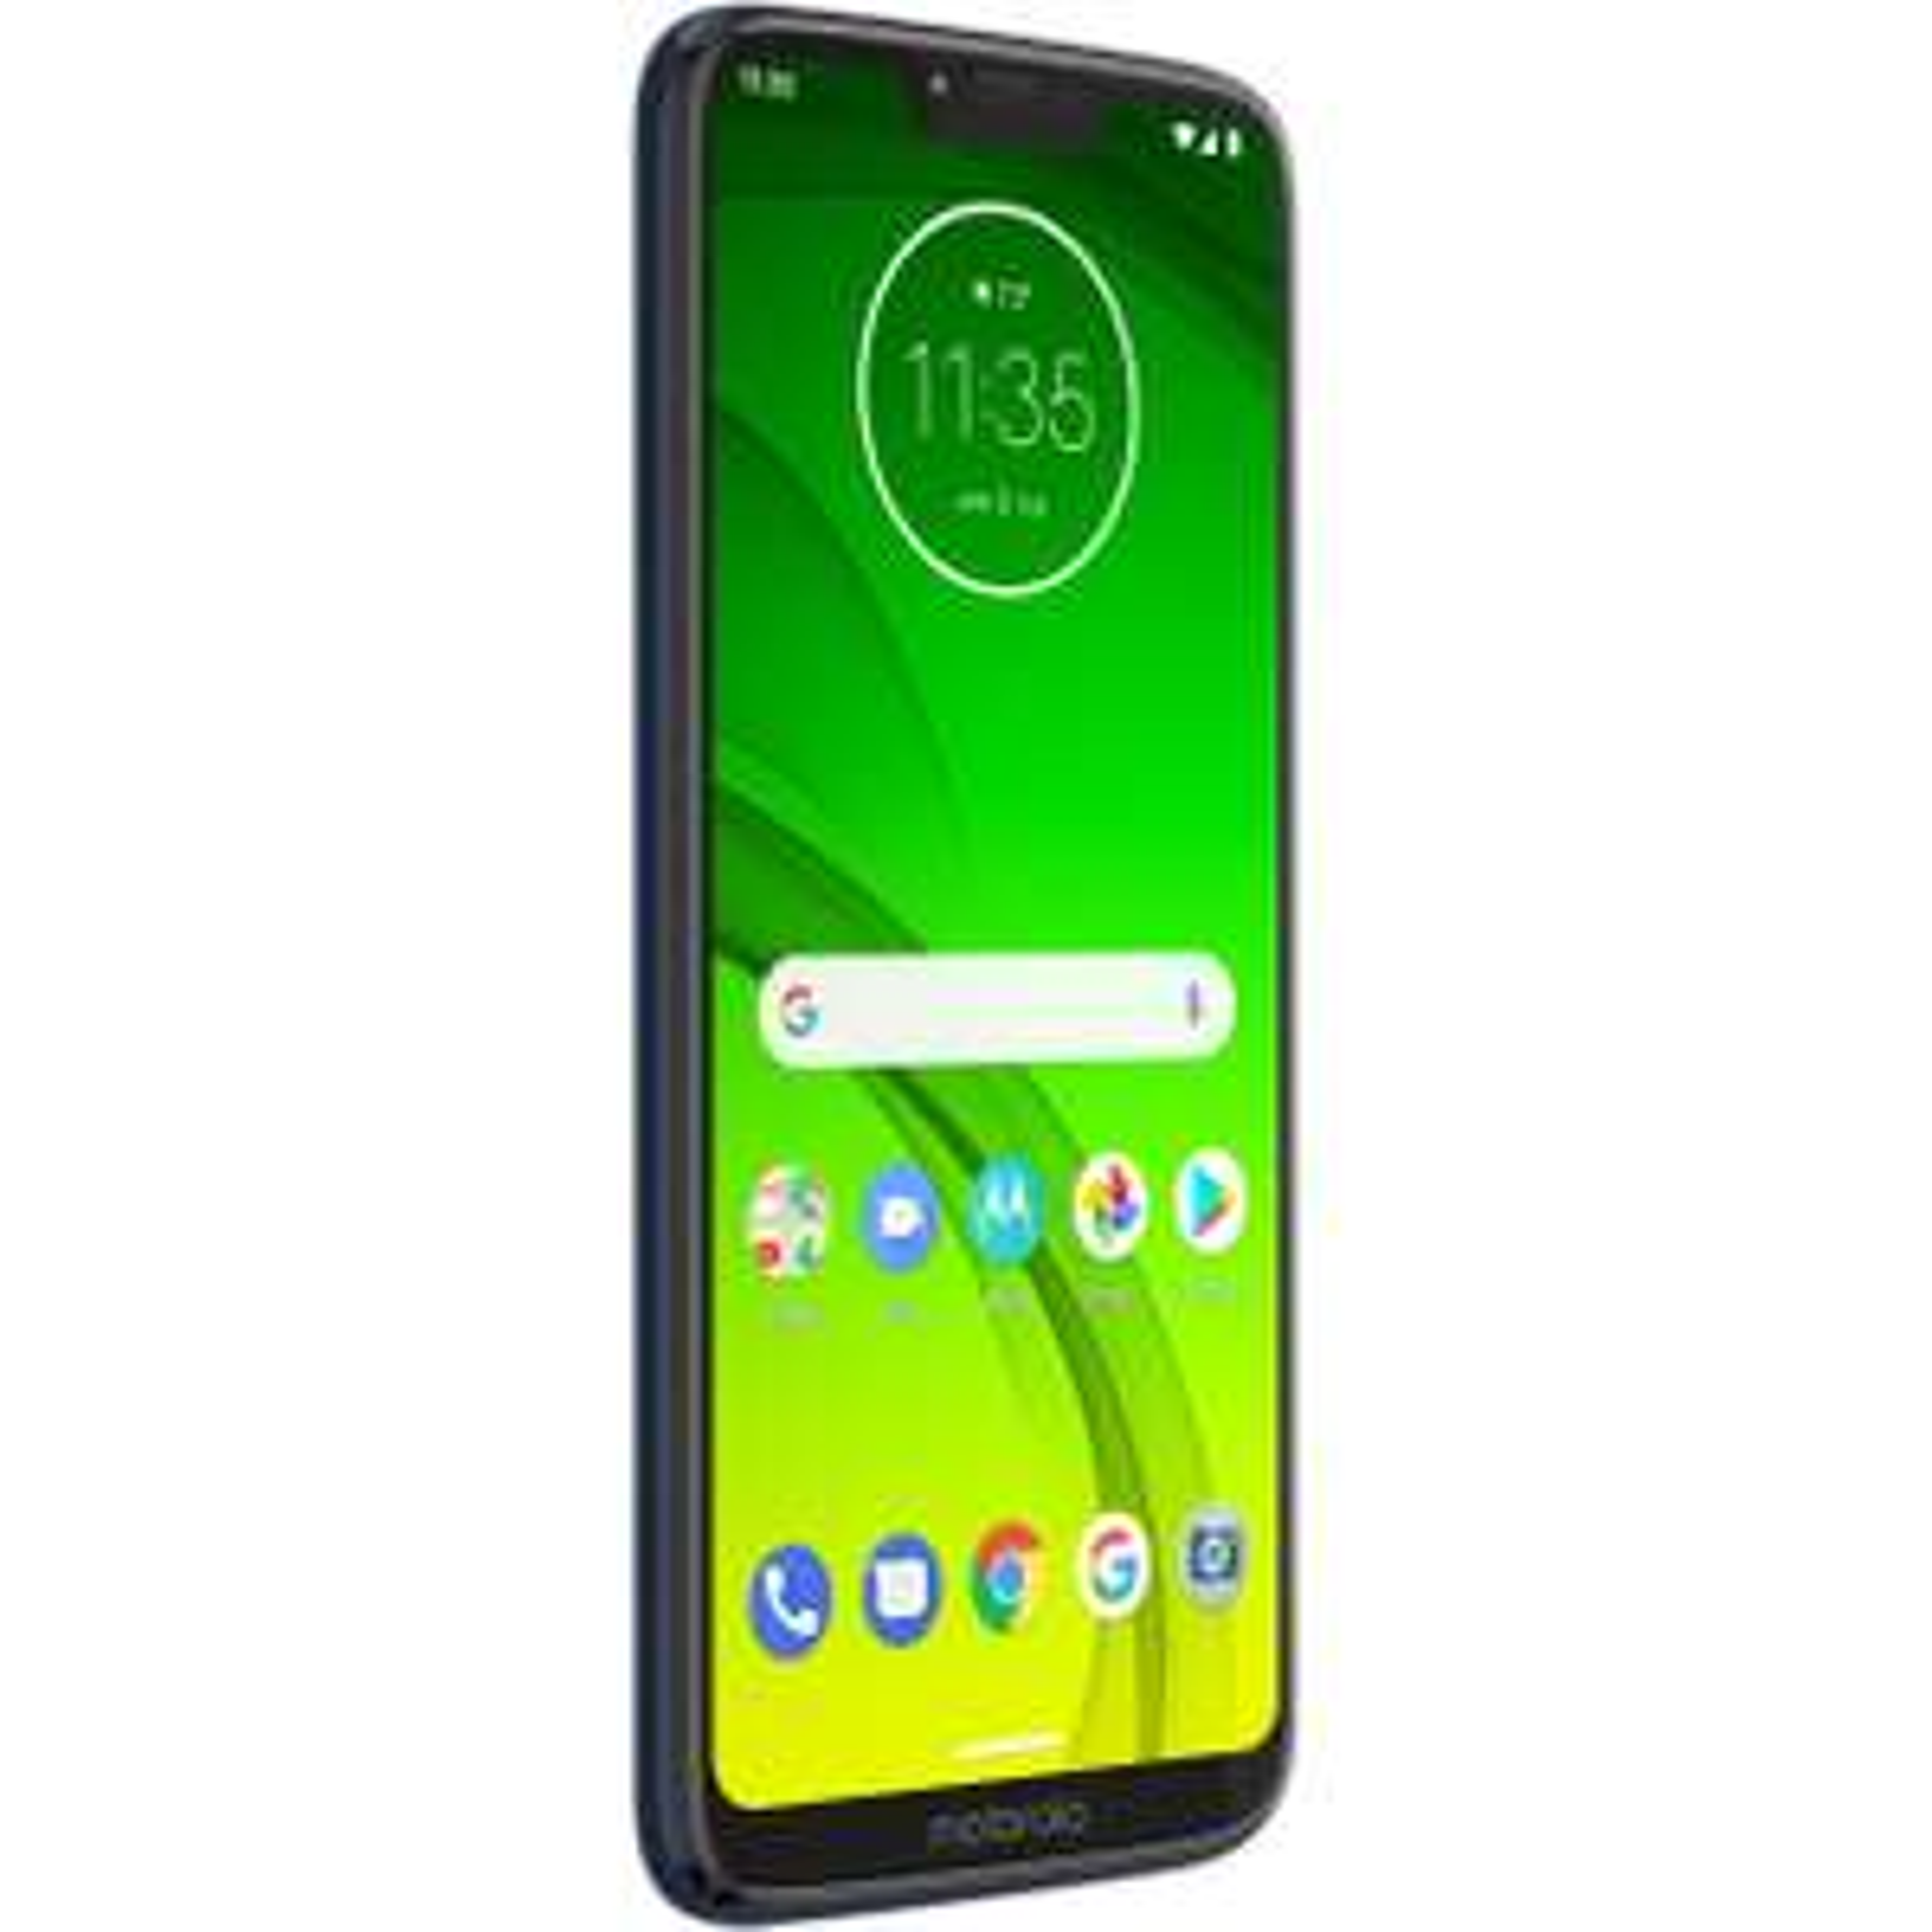 Tesco Mobile Deals & Sales for August 2019 - hotukdeals